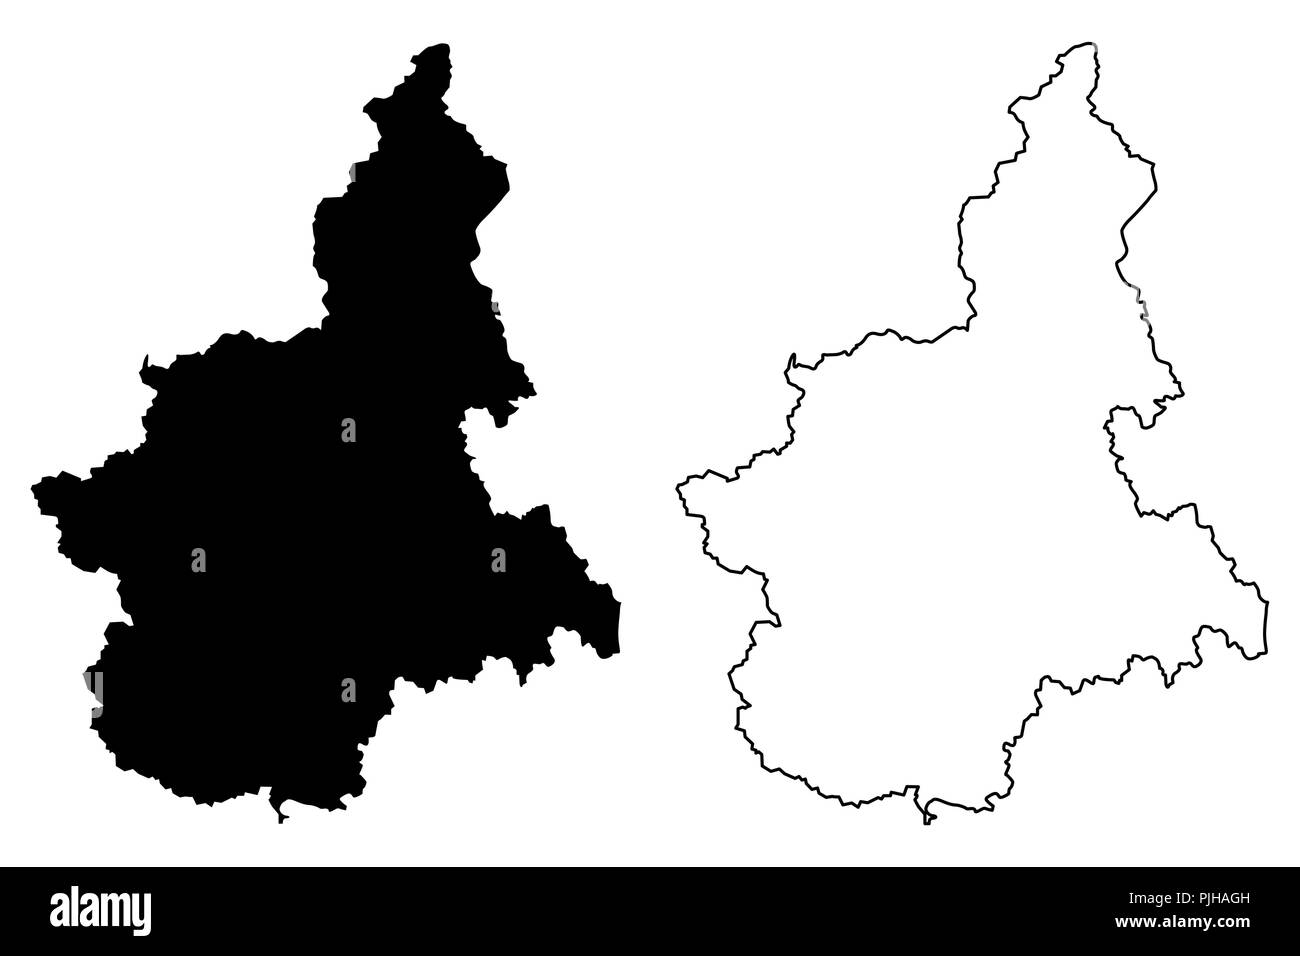 Cartina Muta Piemonte.Piedmont Autonomous Region Of Italy Map Vector